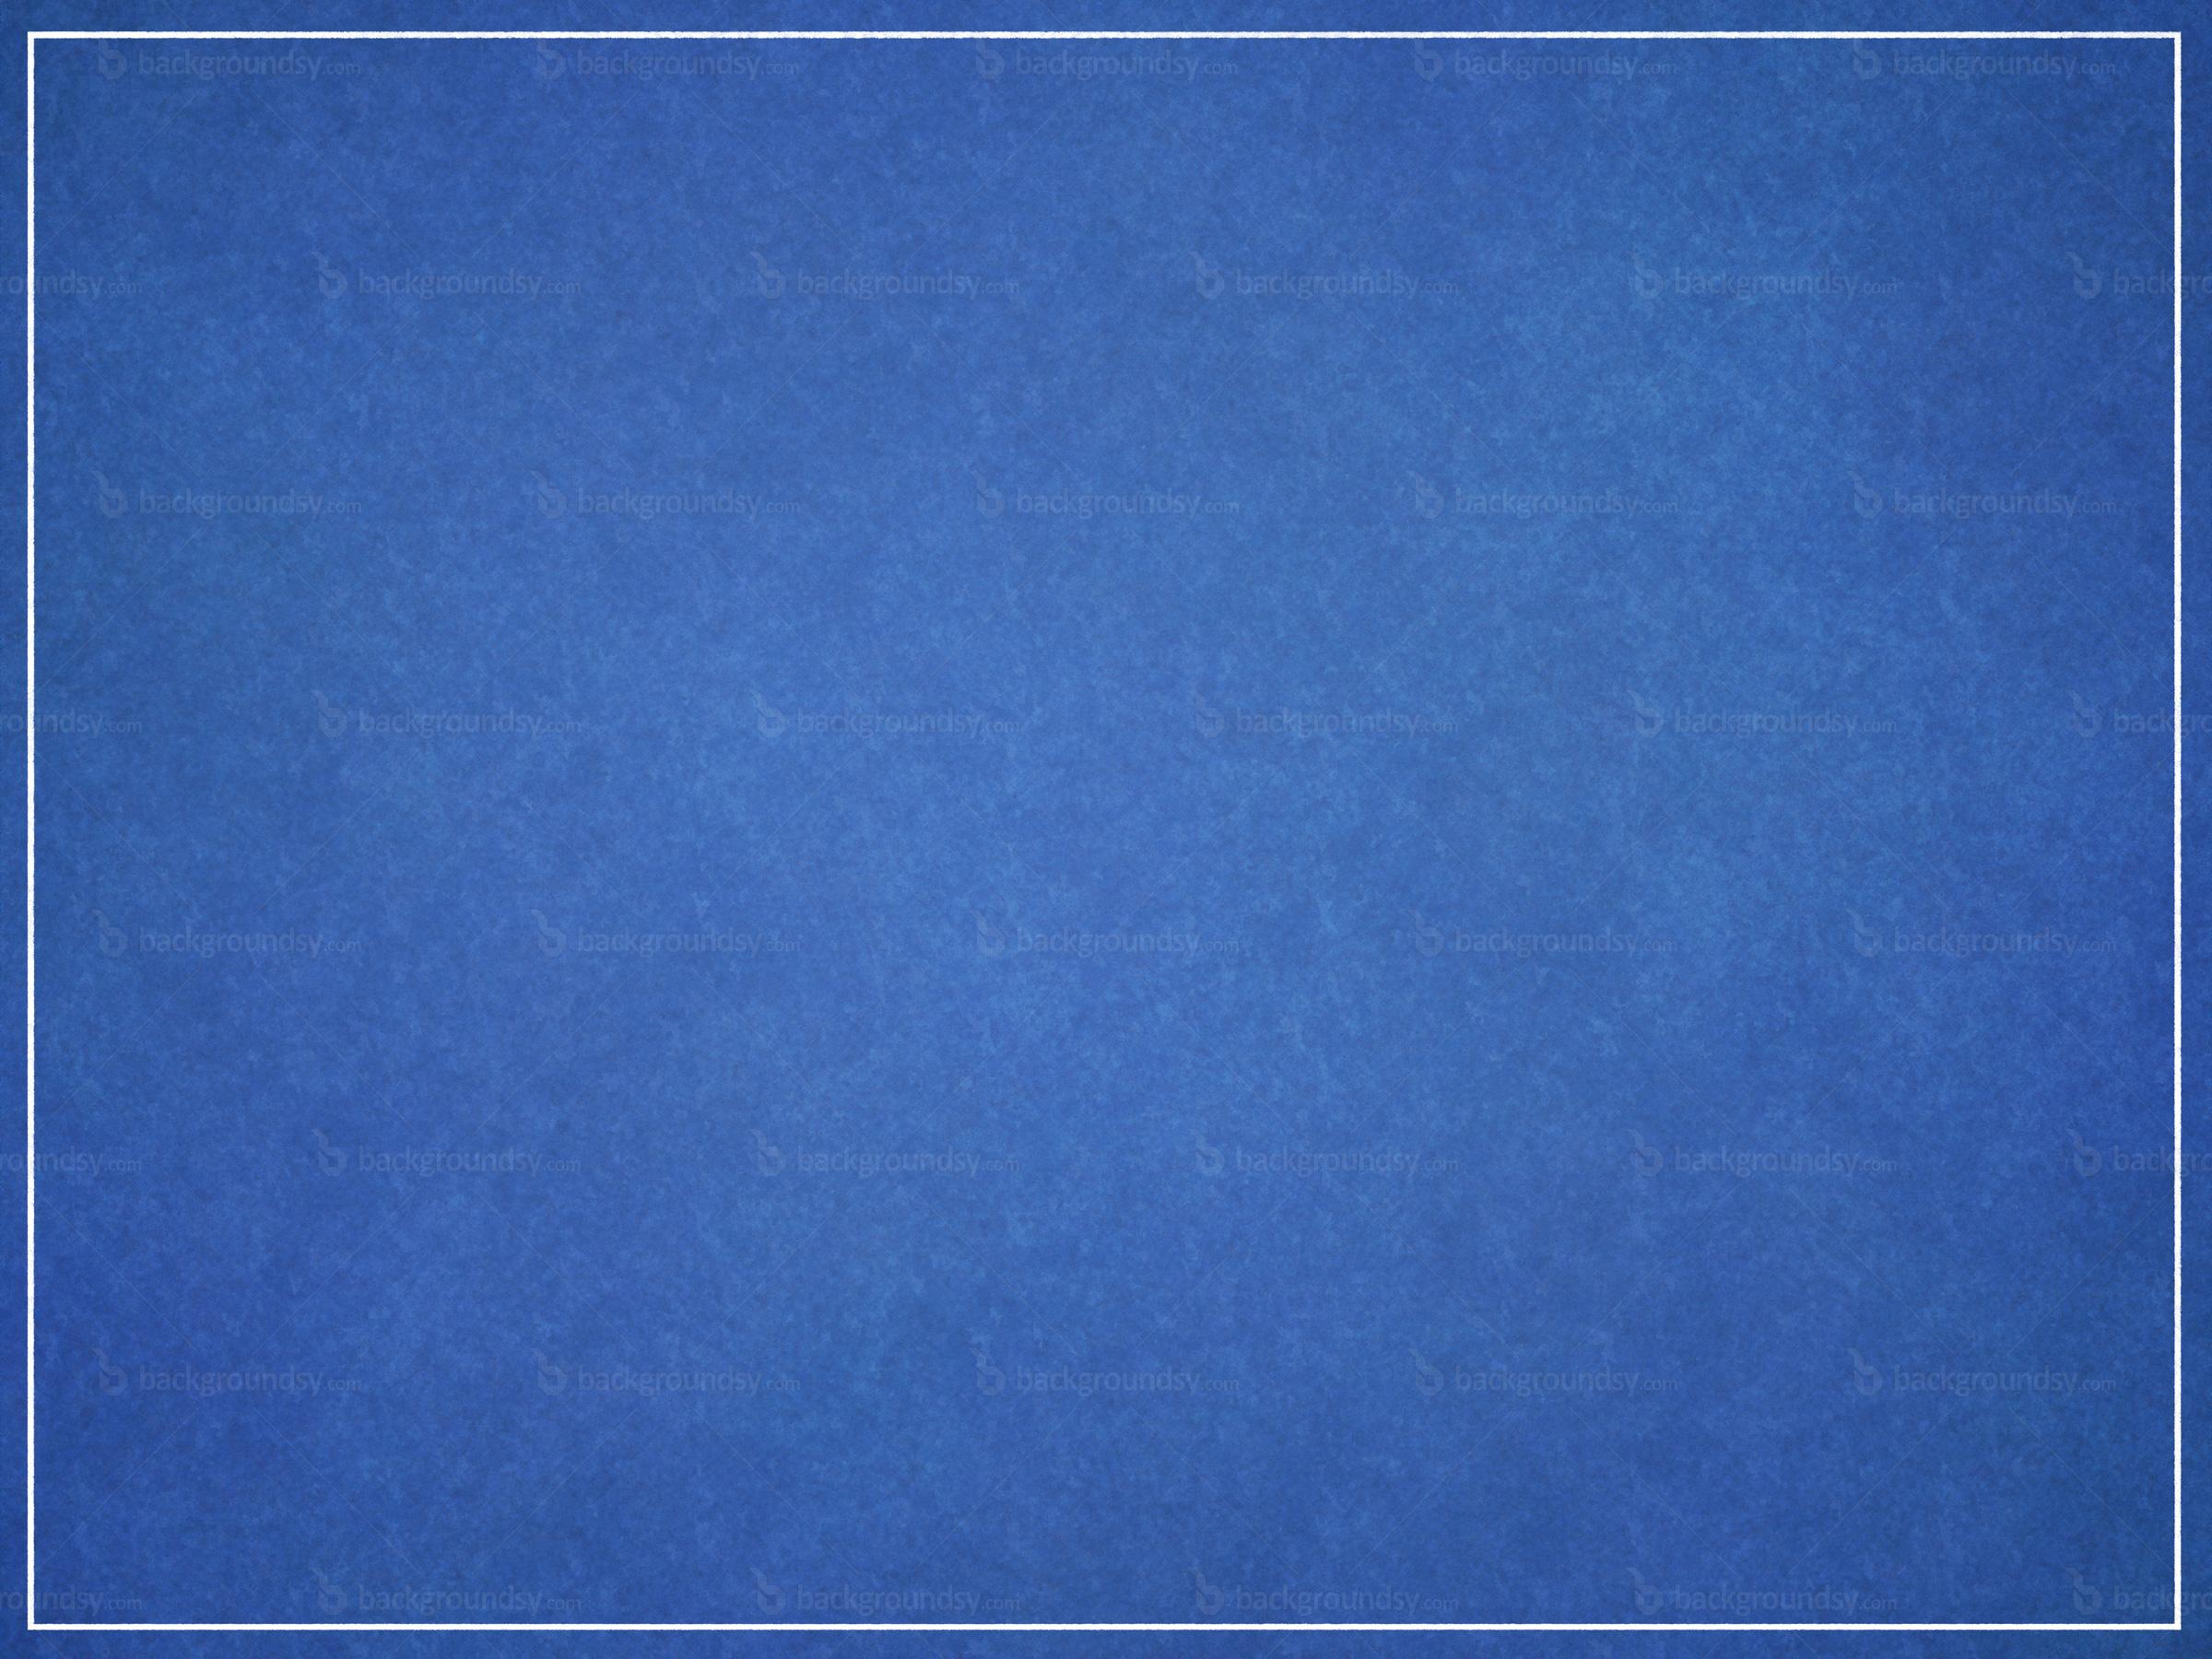 Blue print background wallpapersafari blueprint background for pinterest 2400x1800 malvernweather Choice Image